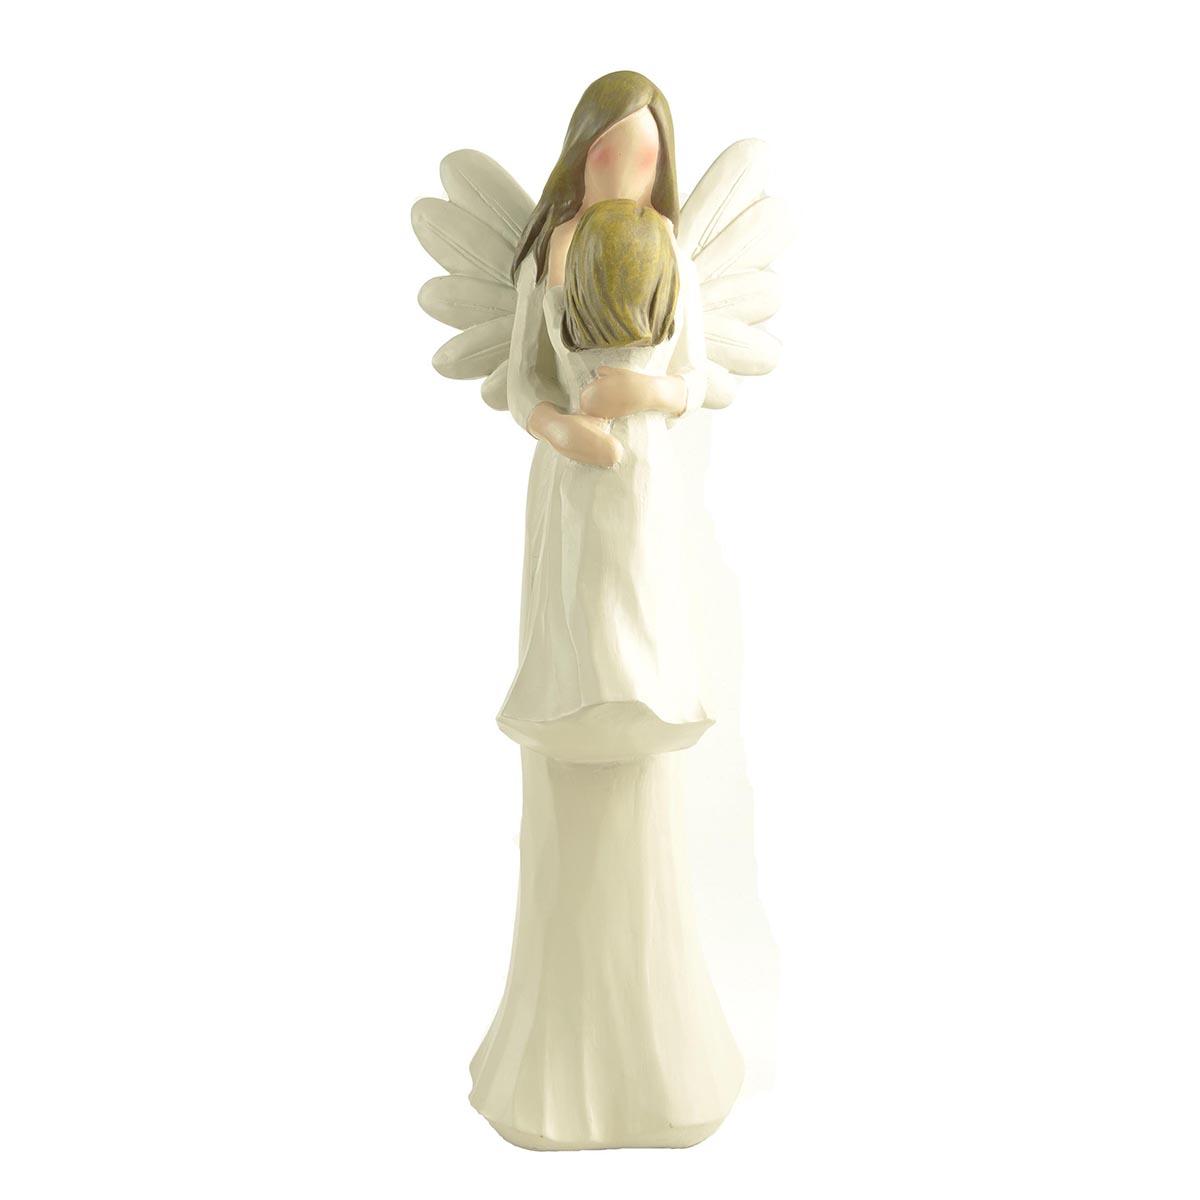 Ennas home interior angel figurines handicraft for ornaments-1